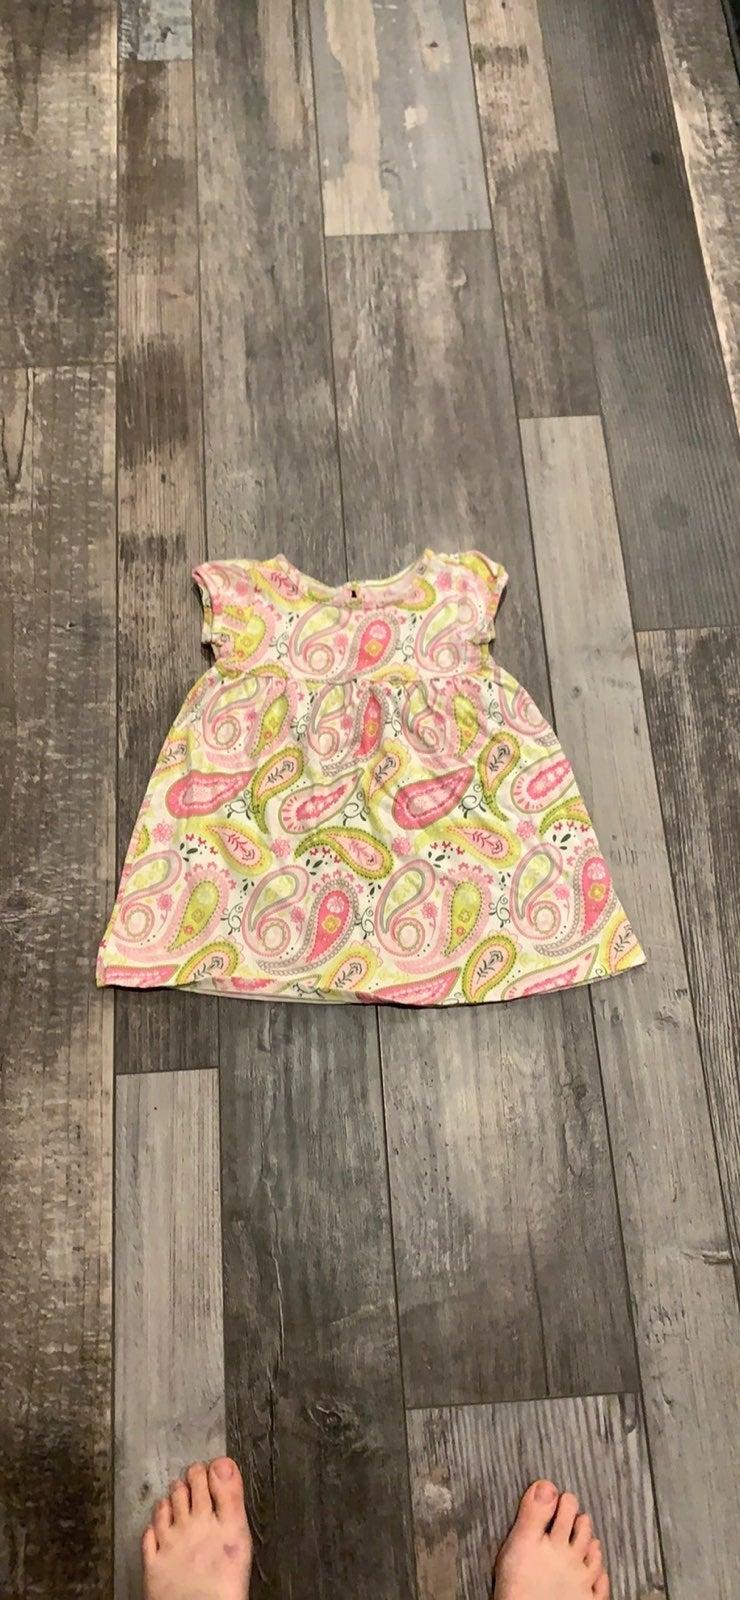 LL Bean 2t dress